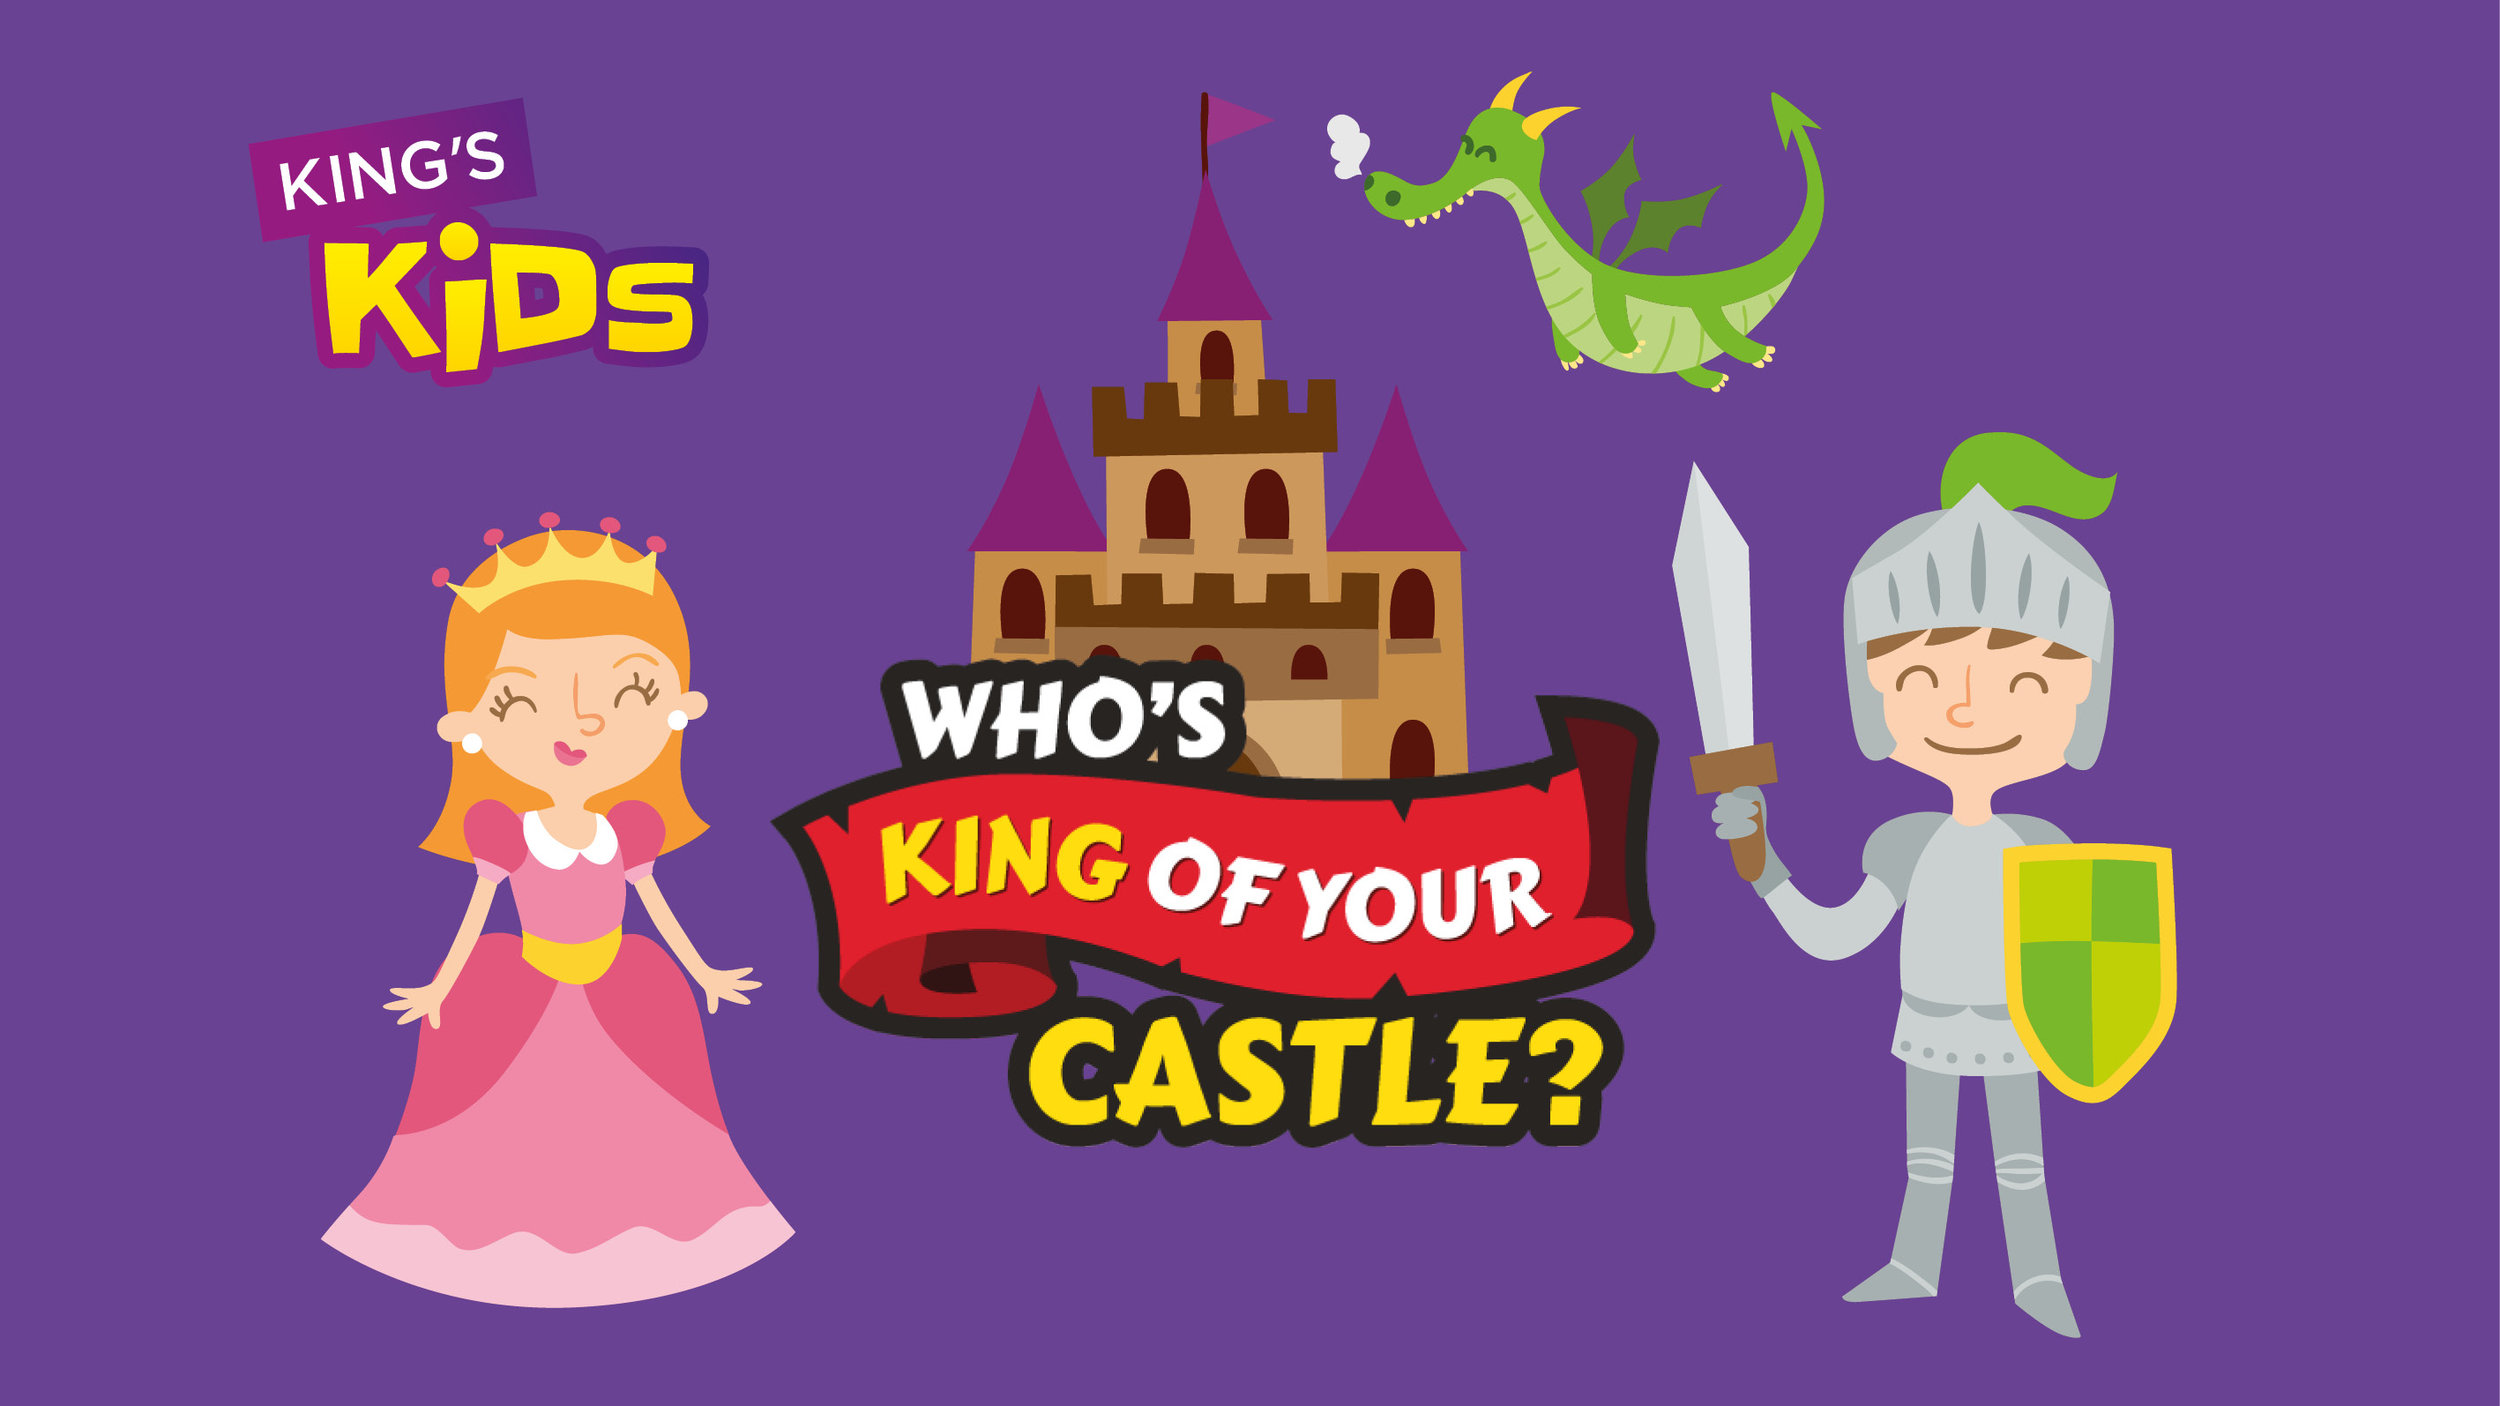 Kings_KC_Kids_Castle_PPT_S1.jpg